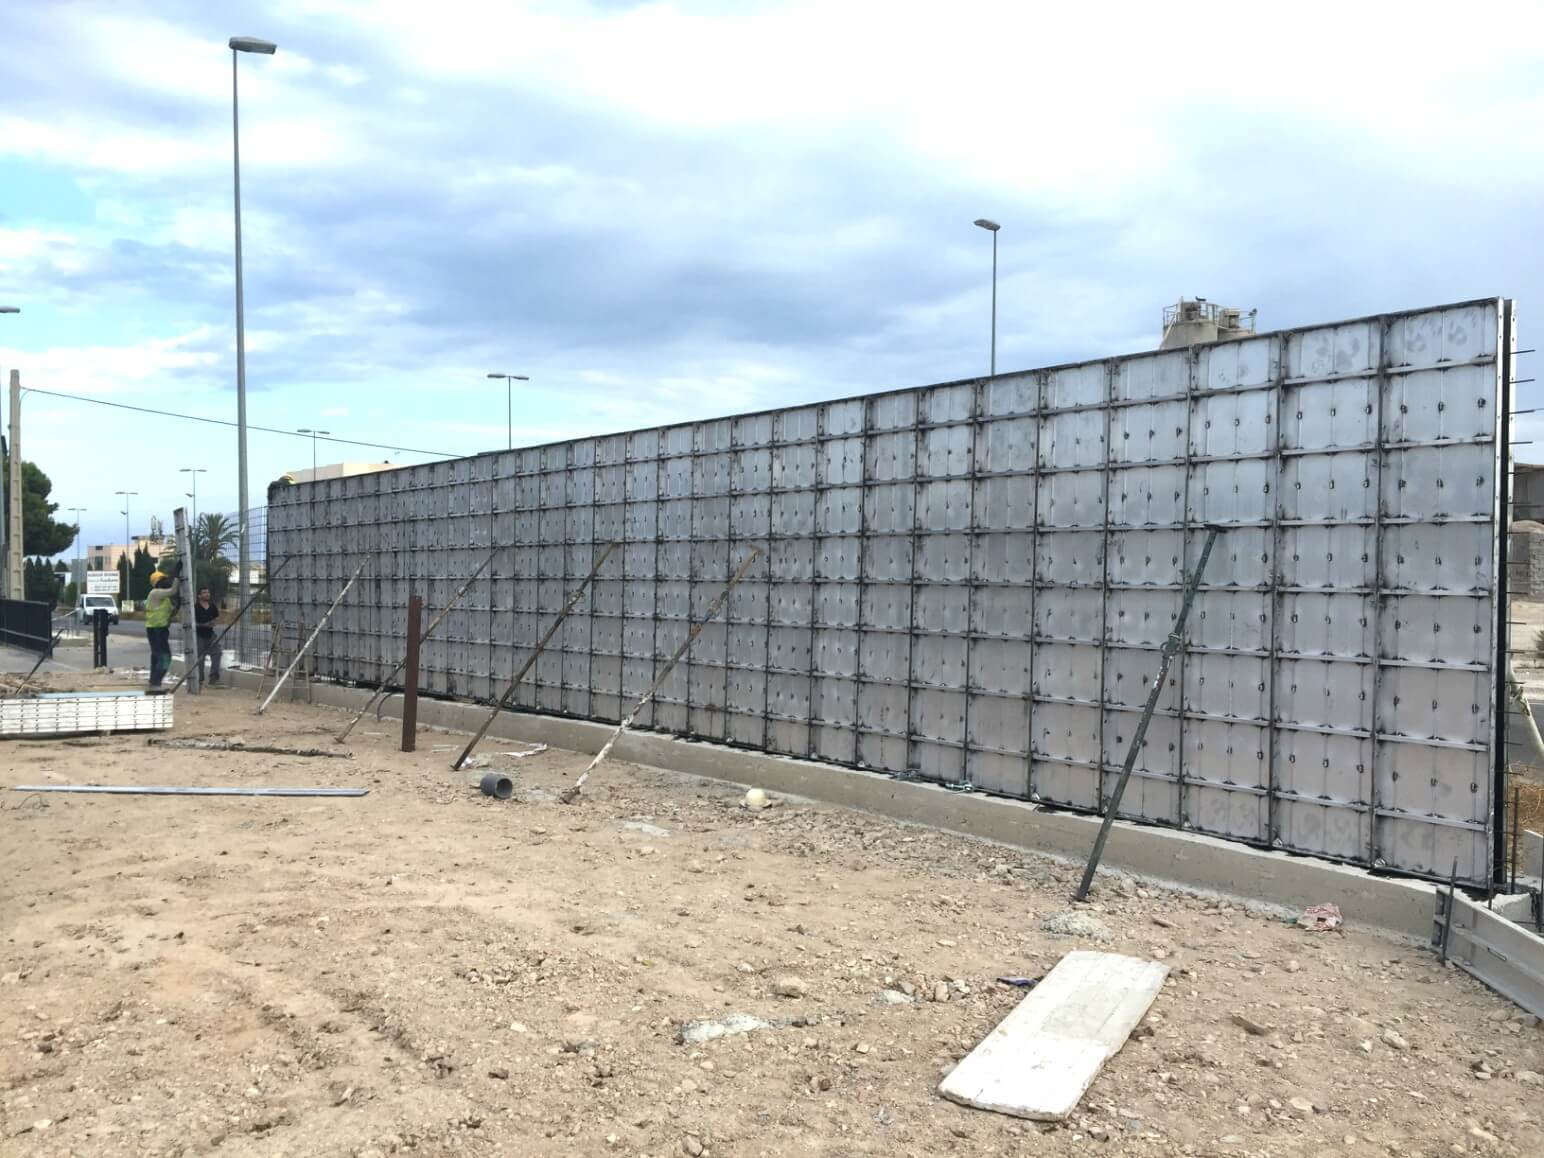 proyecto muro perimetral encofrados de aluminio construccion strong forms alicante 7